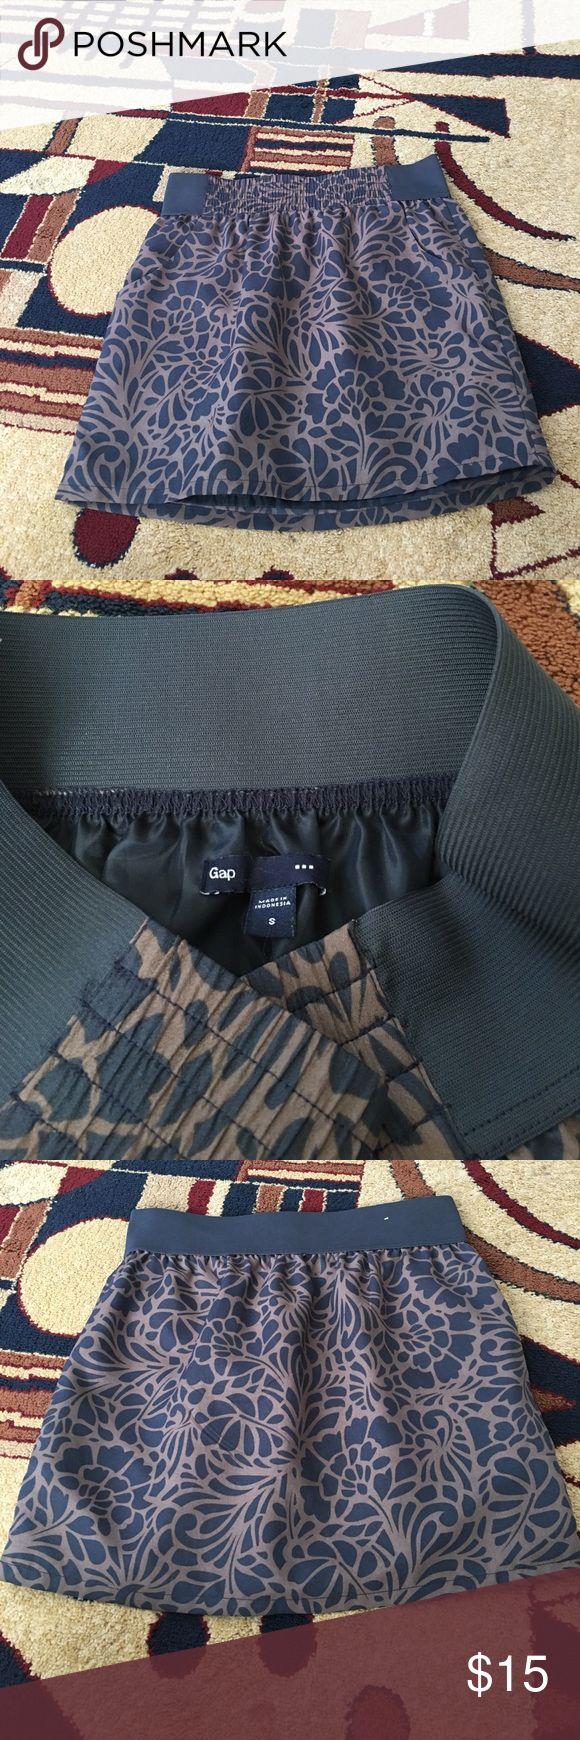 Gap Outlet - size small short skirt EUC - Gap Outlet - size small short skirt GAP Skirts Mini